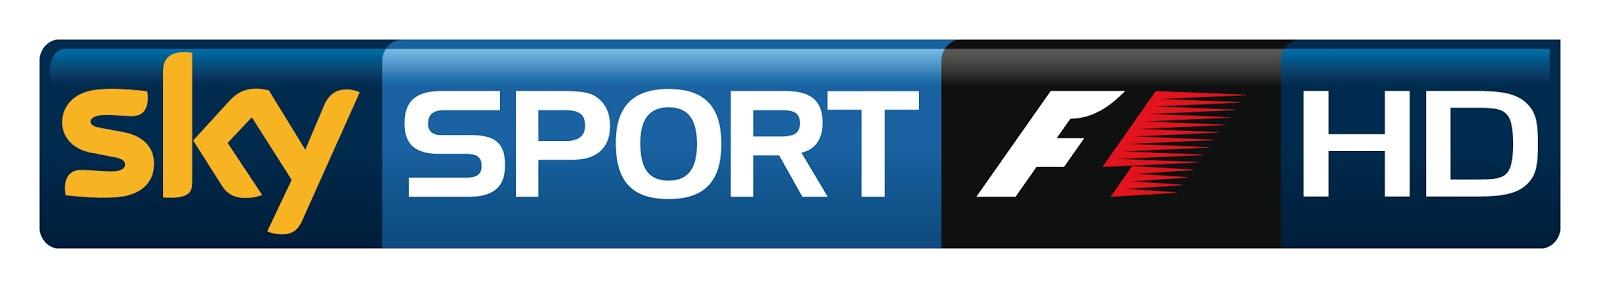 Image - Sky Sport F1 HD.JPG - Logopedia, the logo and ...